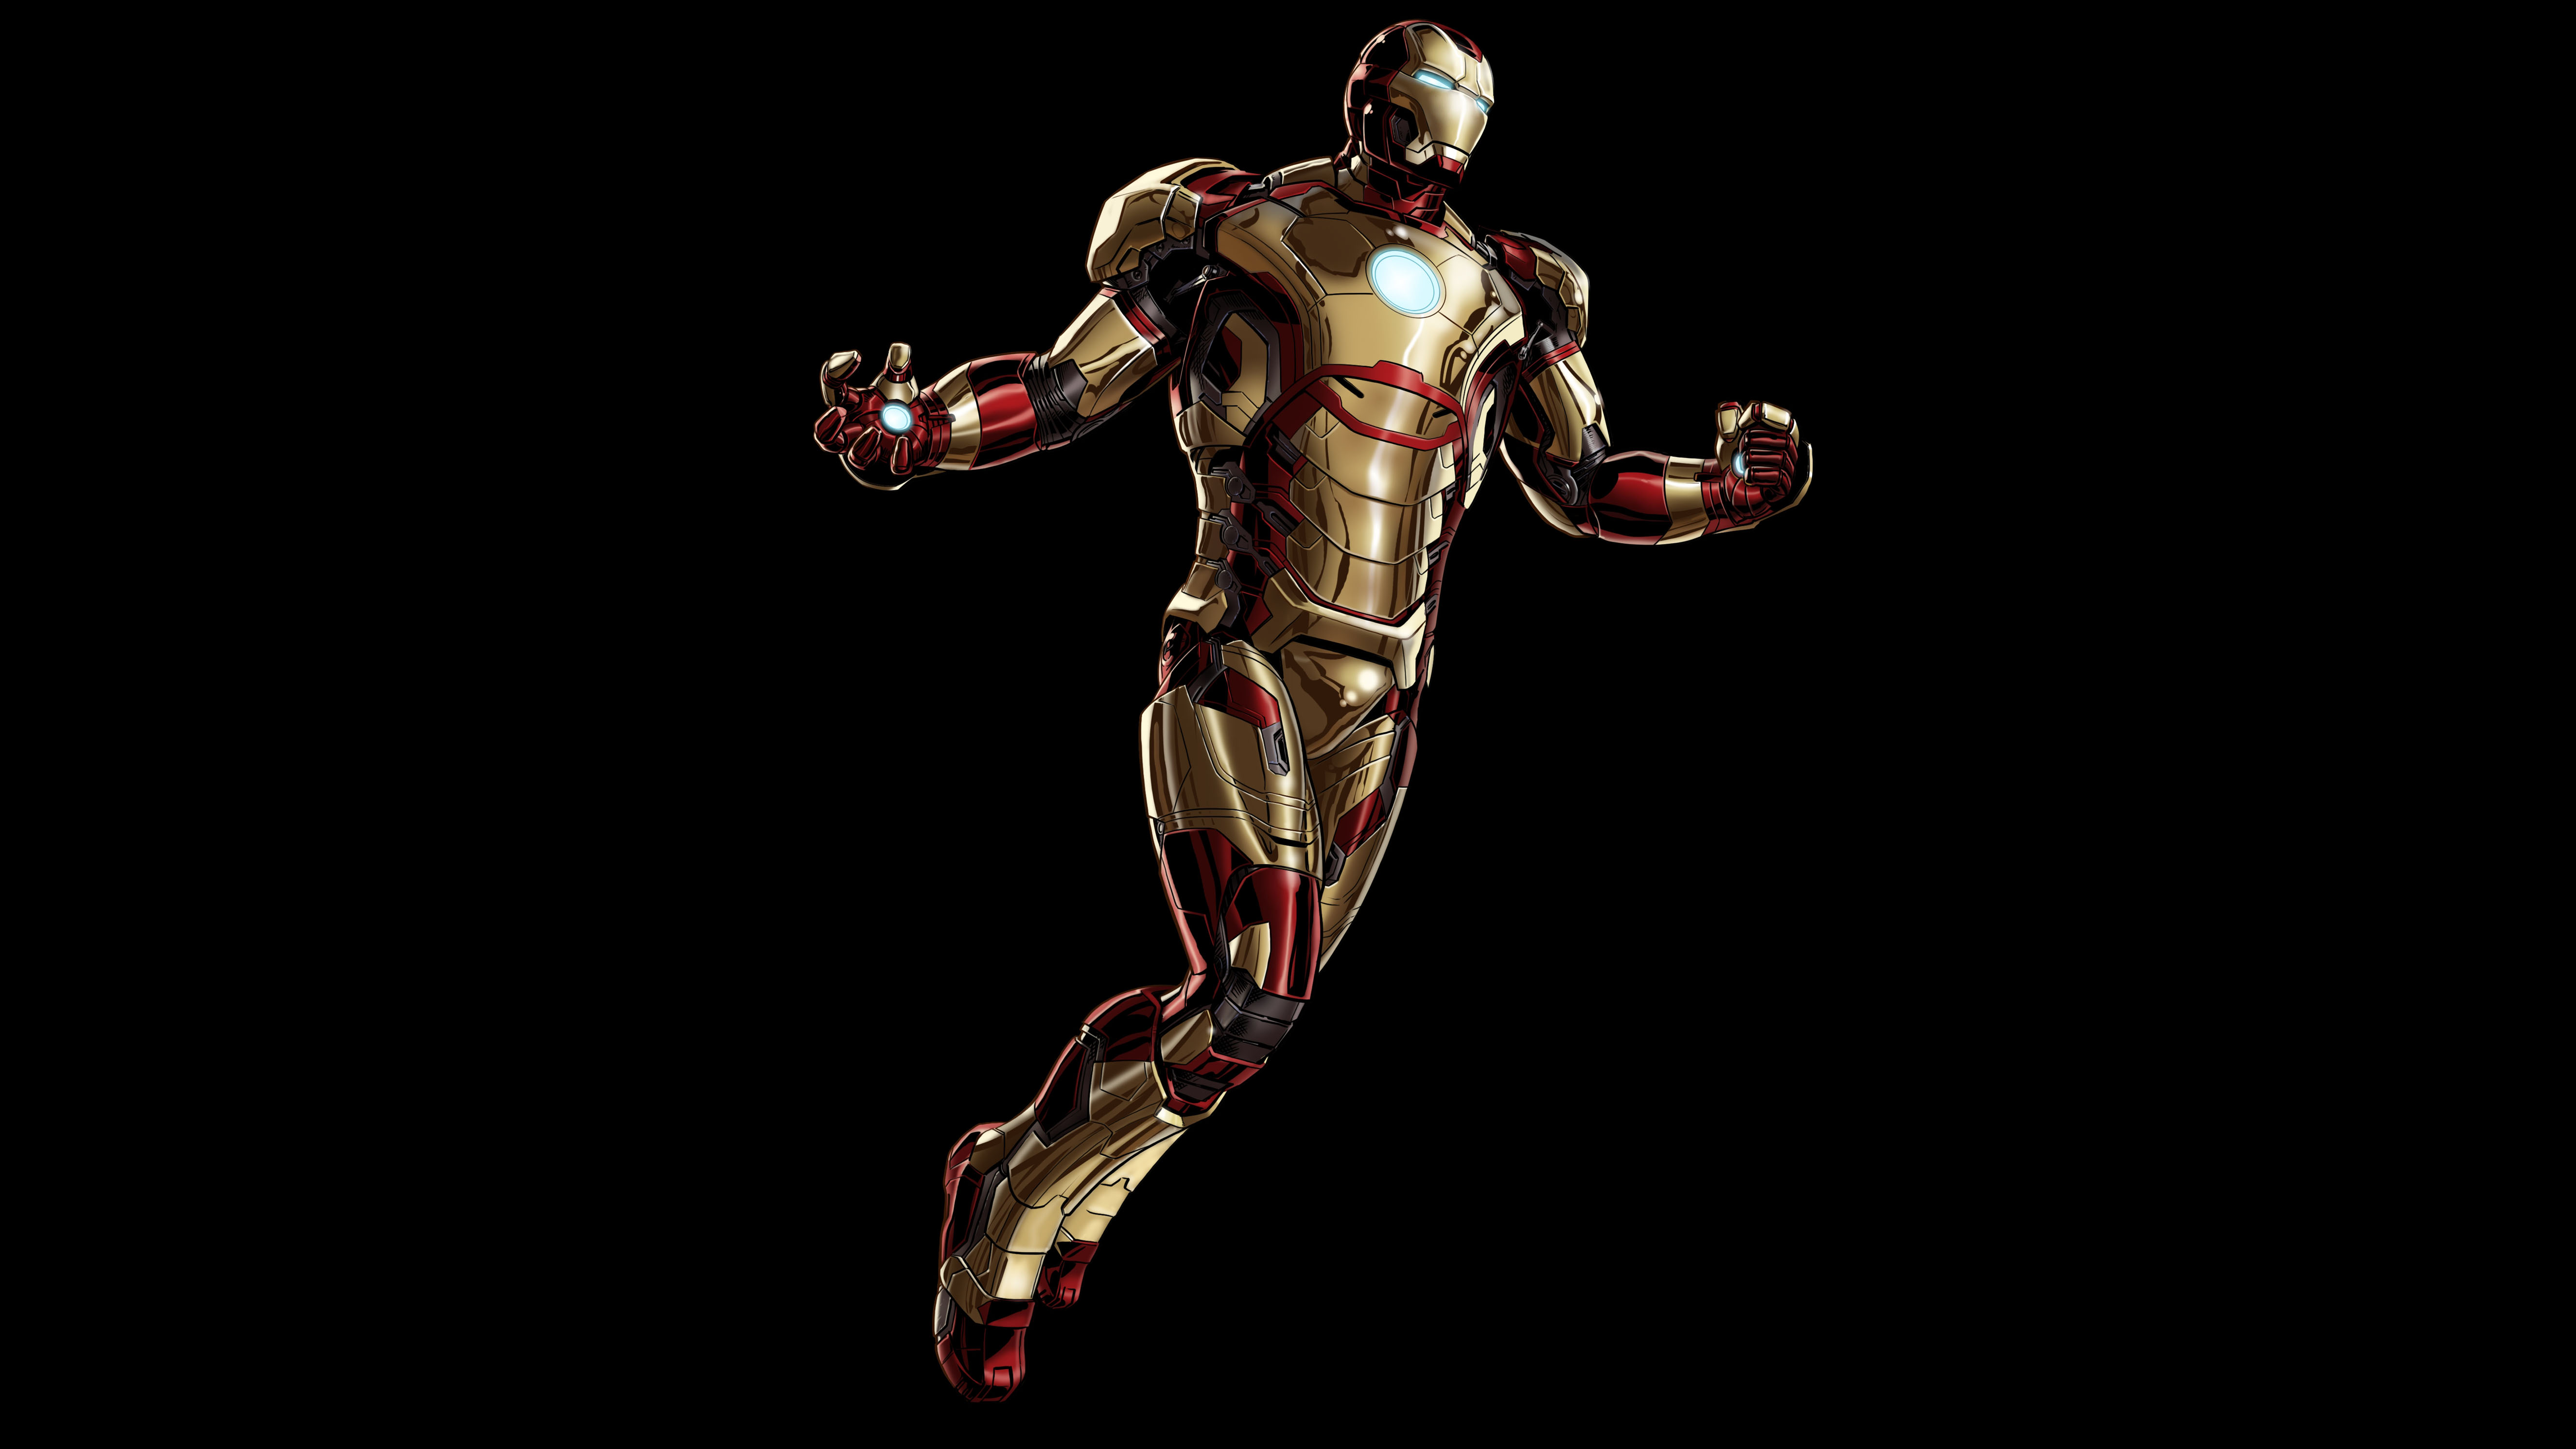 Iron Man Mark 42 (Marvel) 5K UHD Wallpaper HD Wallpaper  Iron Man Mark 4...